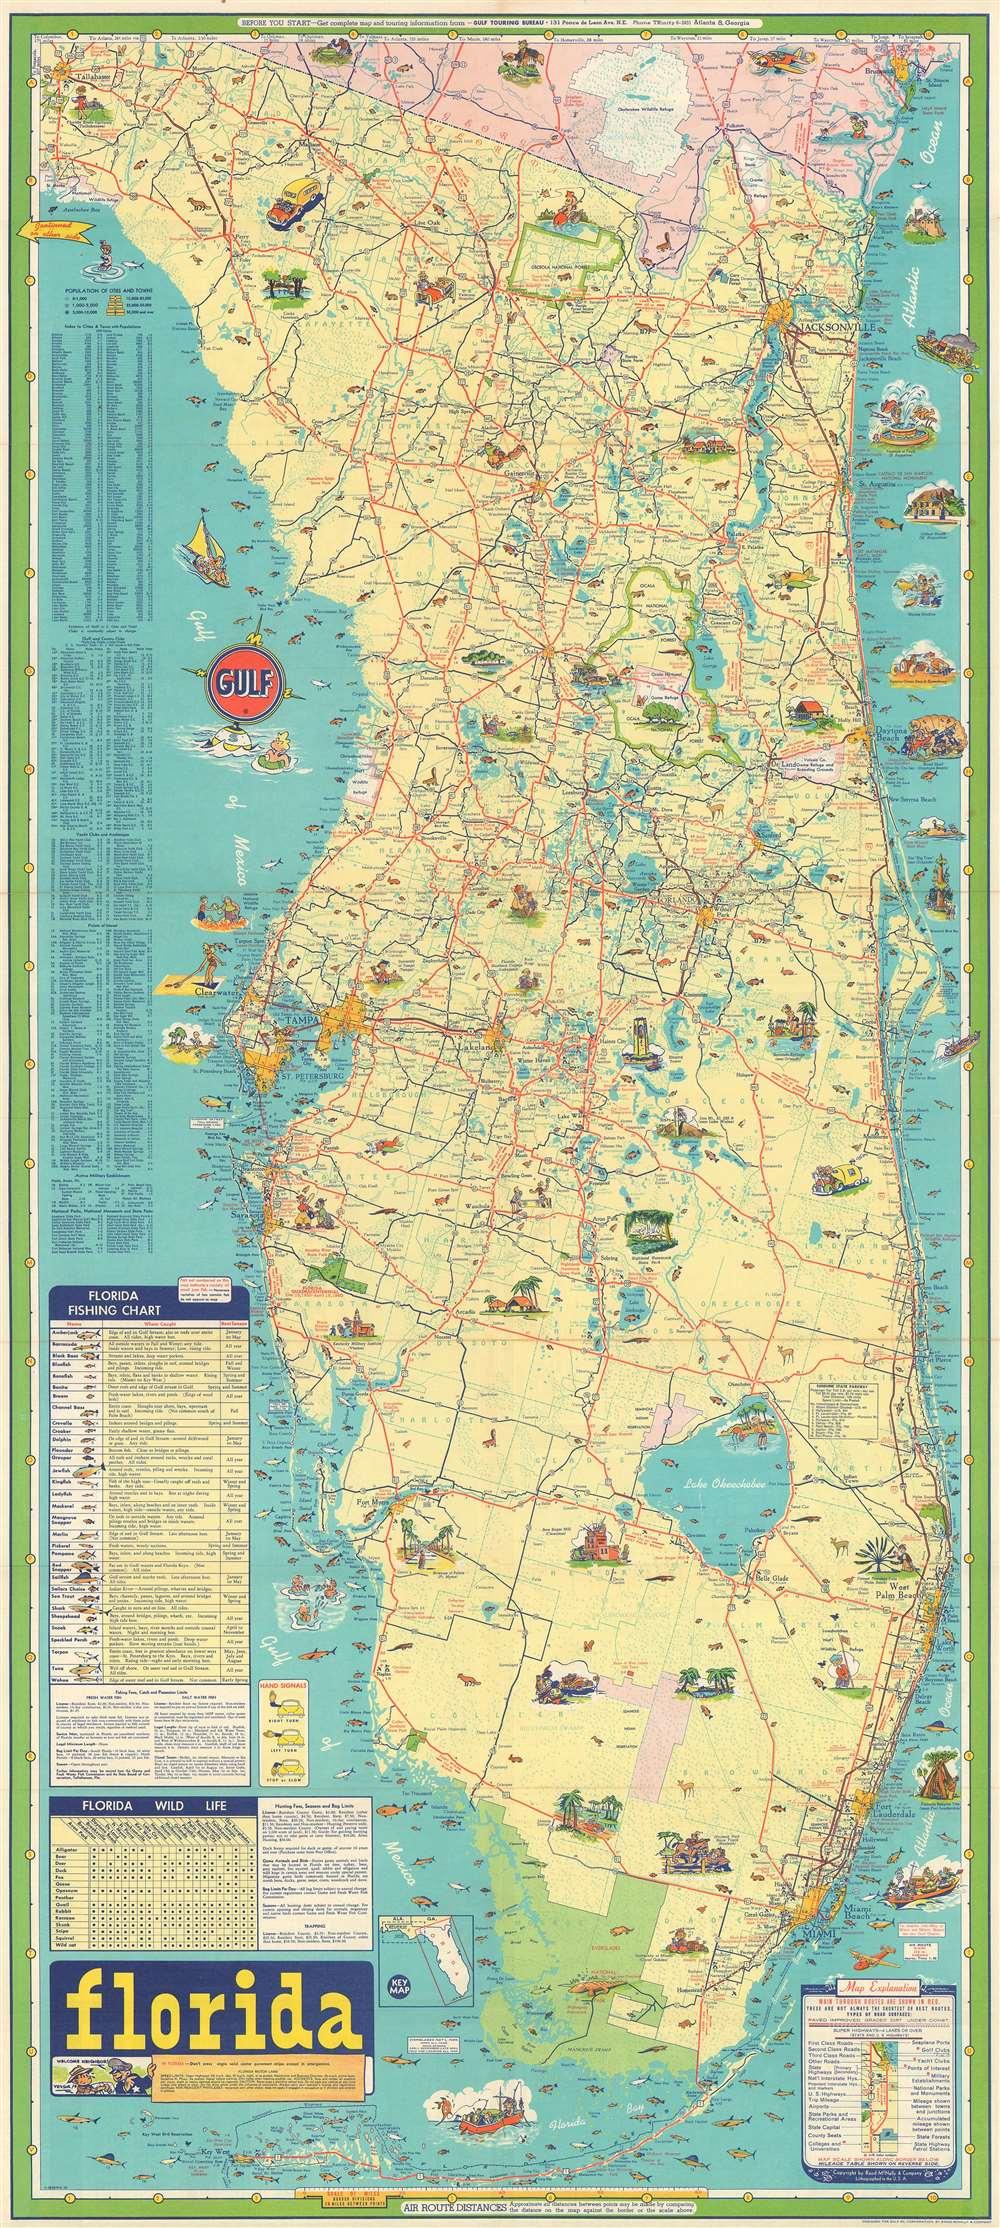 Florida Road Map Atlas.Florida Geographicus Rare Antique Maps